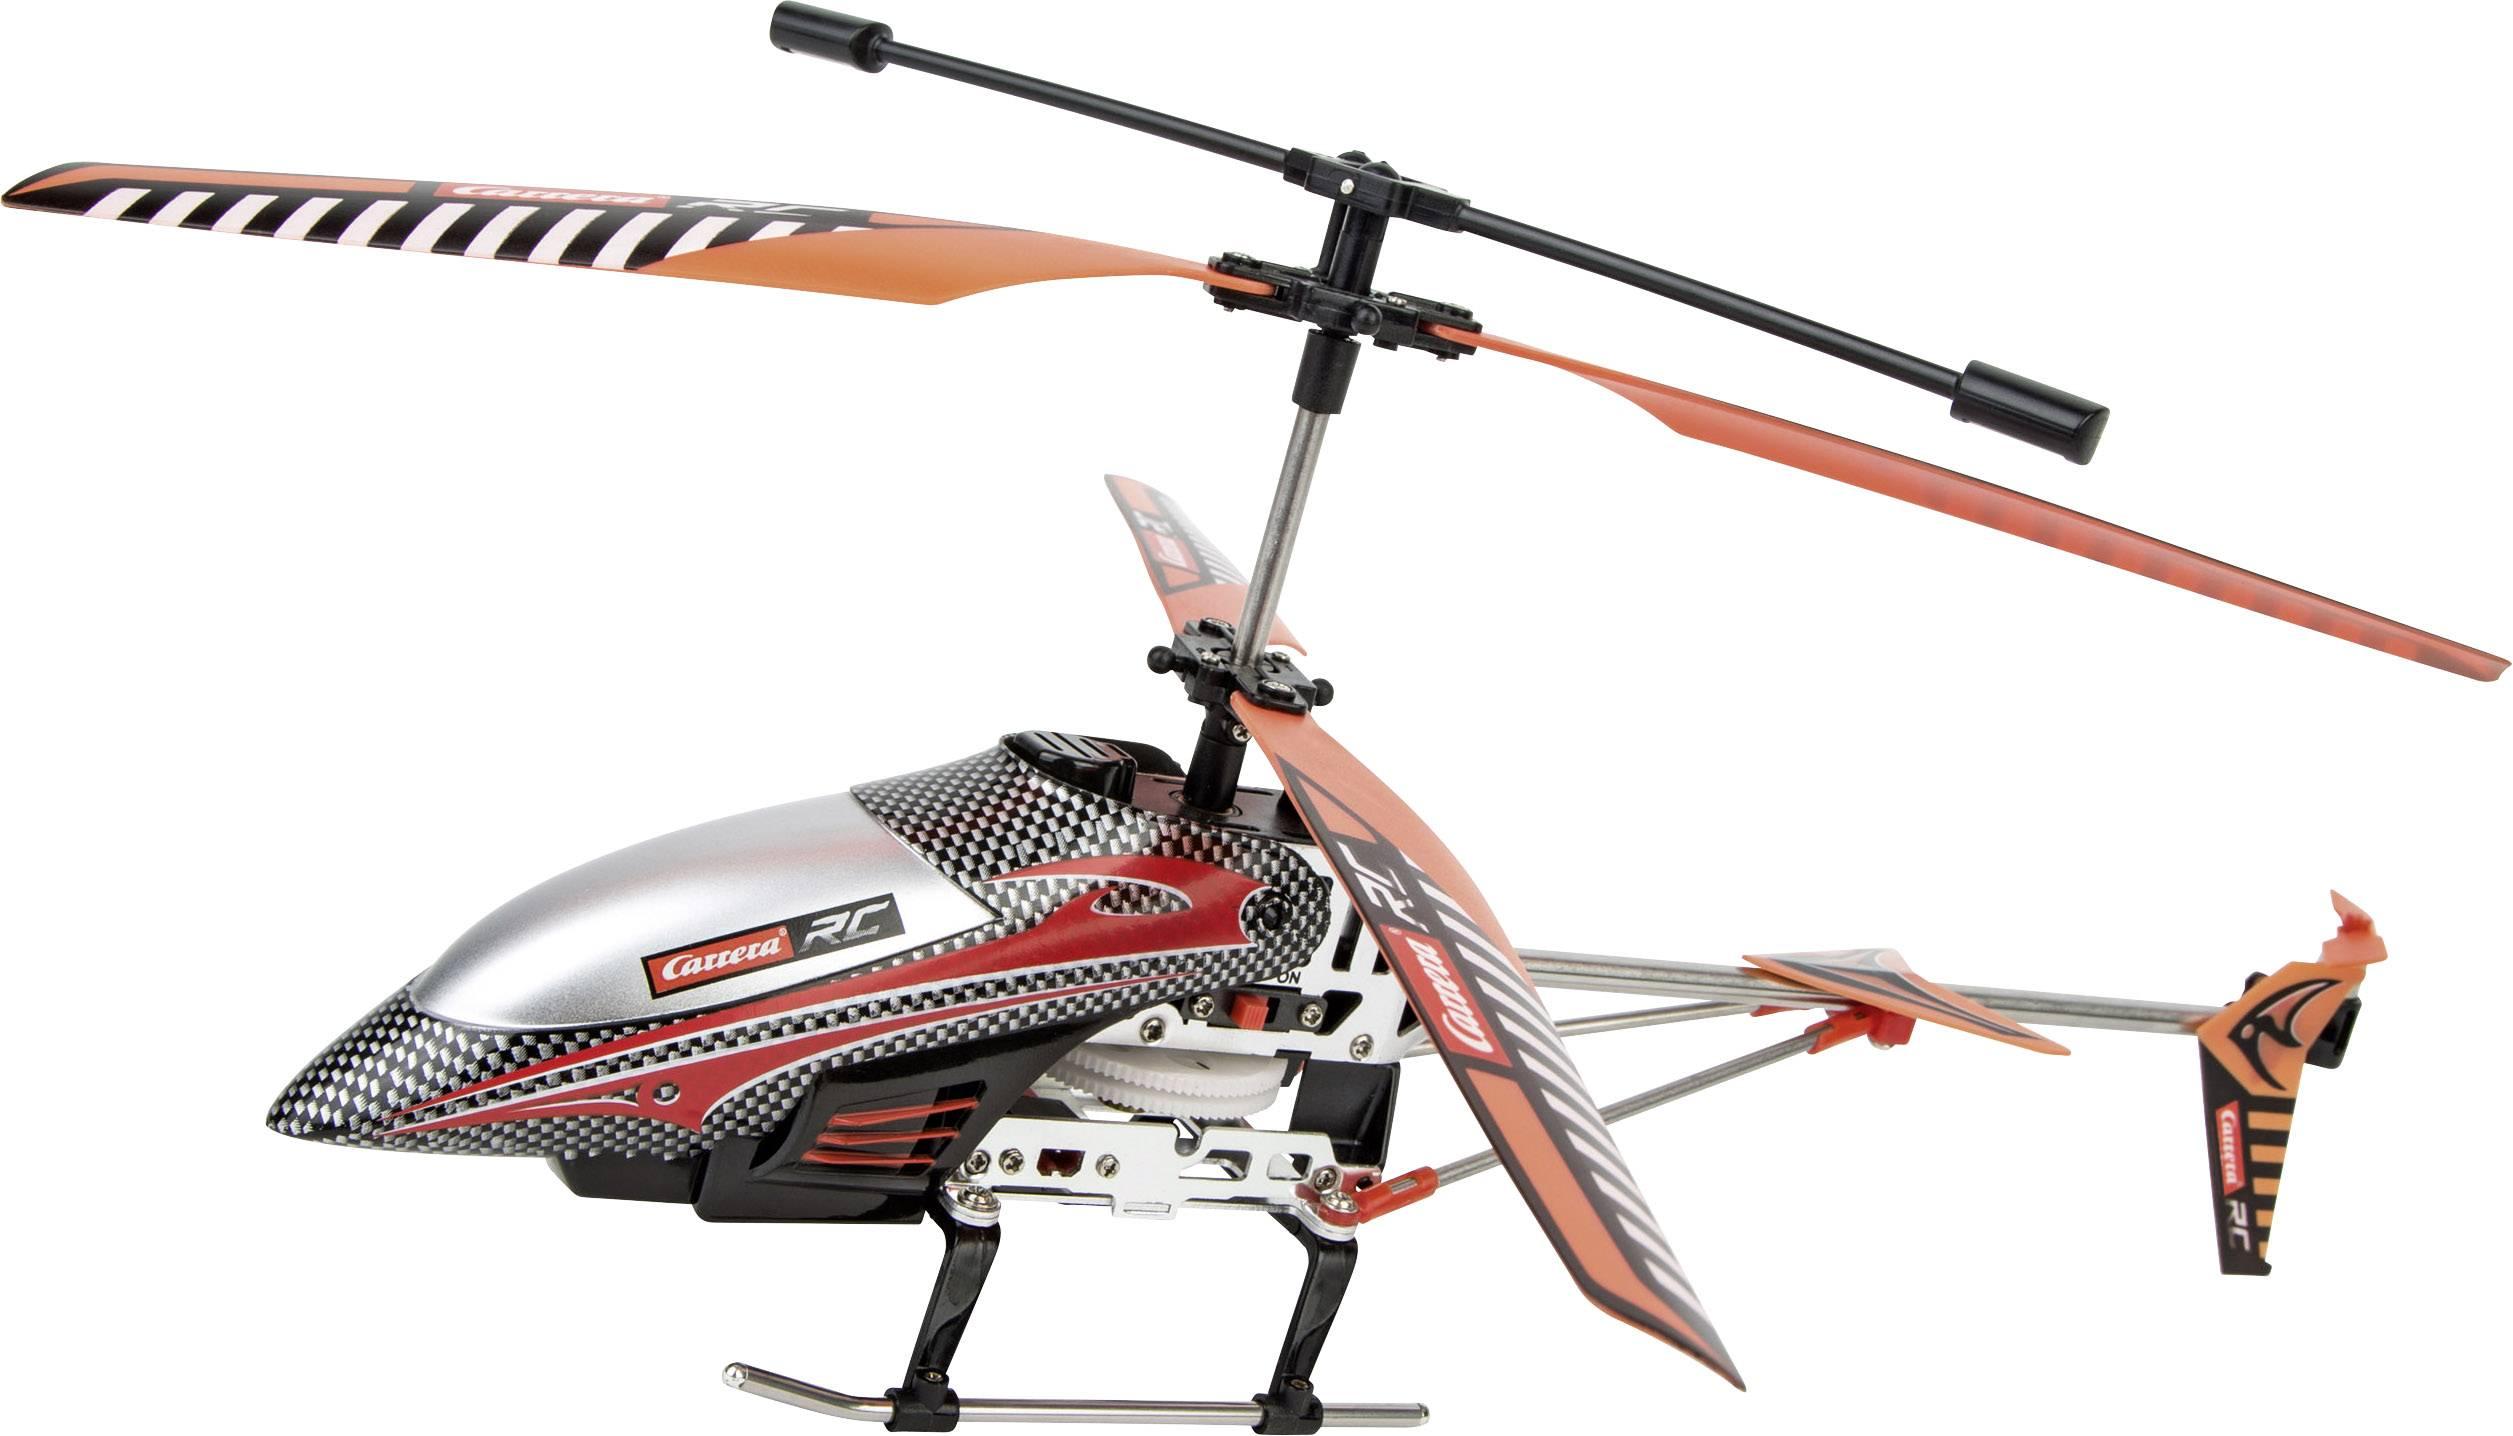 RC vrtuľník Carrera RC Neon Storm, RtF